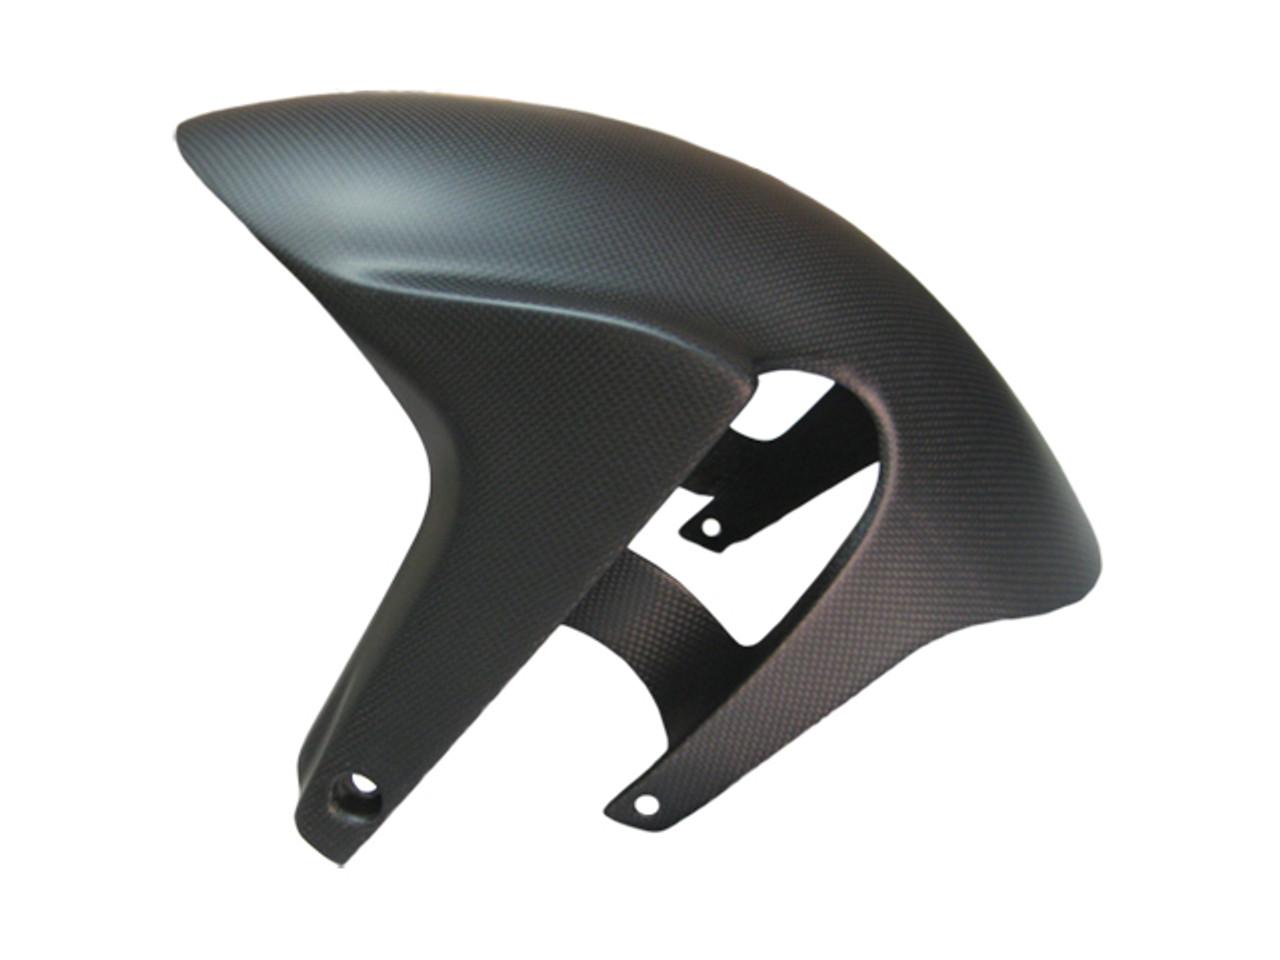 Matte Plain Weave Carbon Fiber Front Fender for Aprilia RSV4 2009+, Tuono V4 2011+